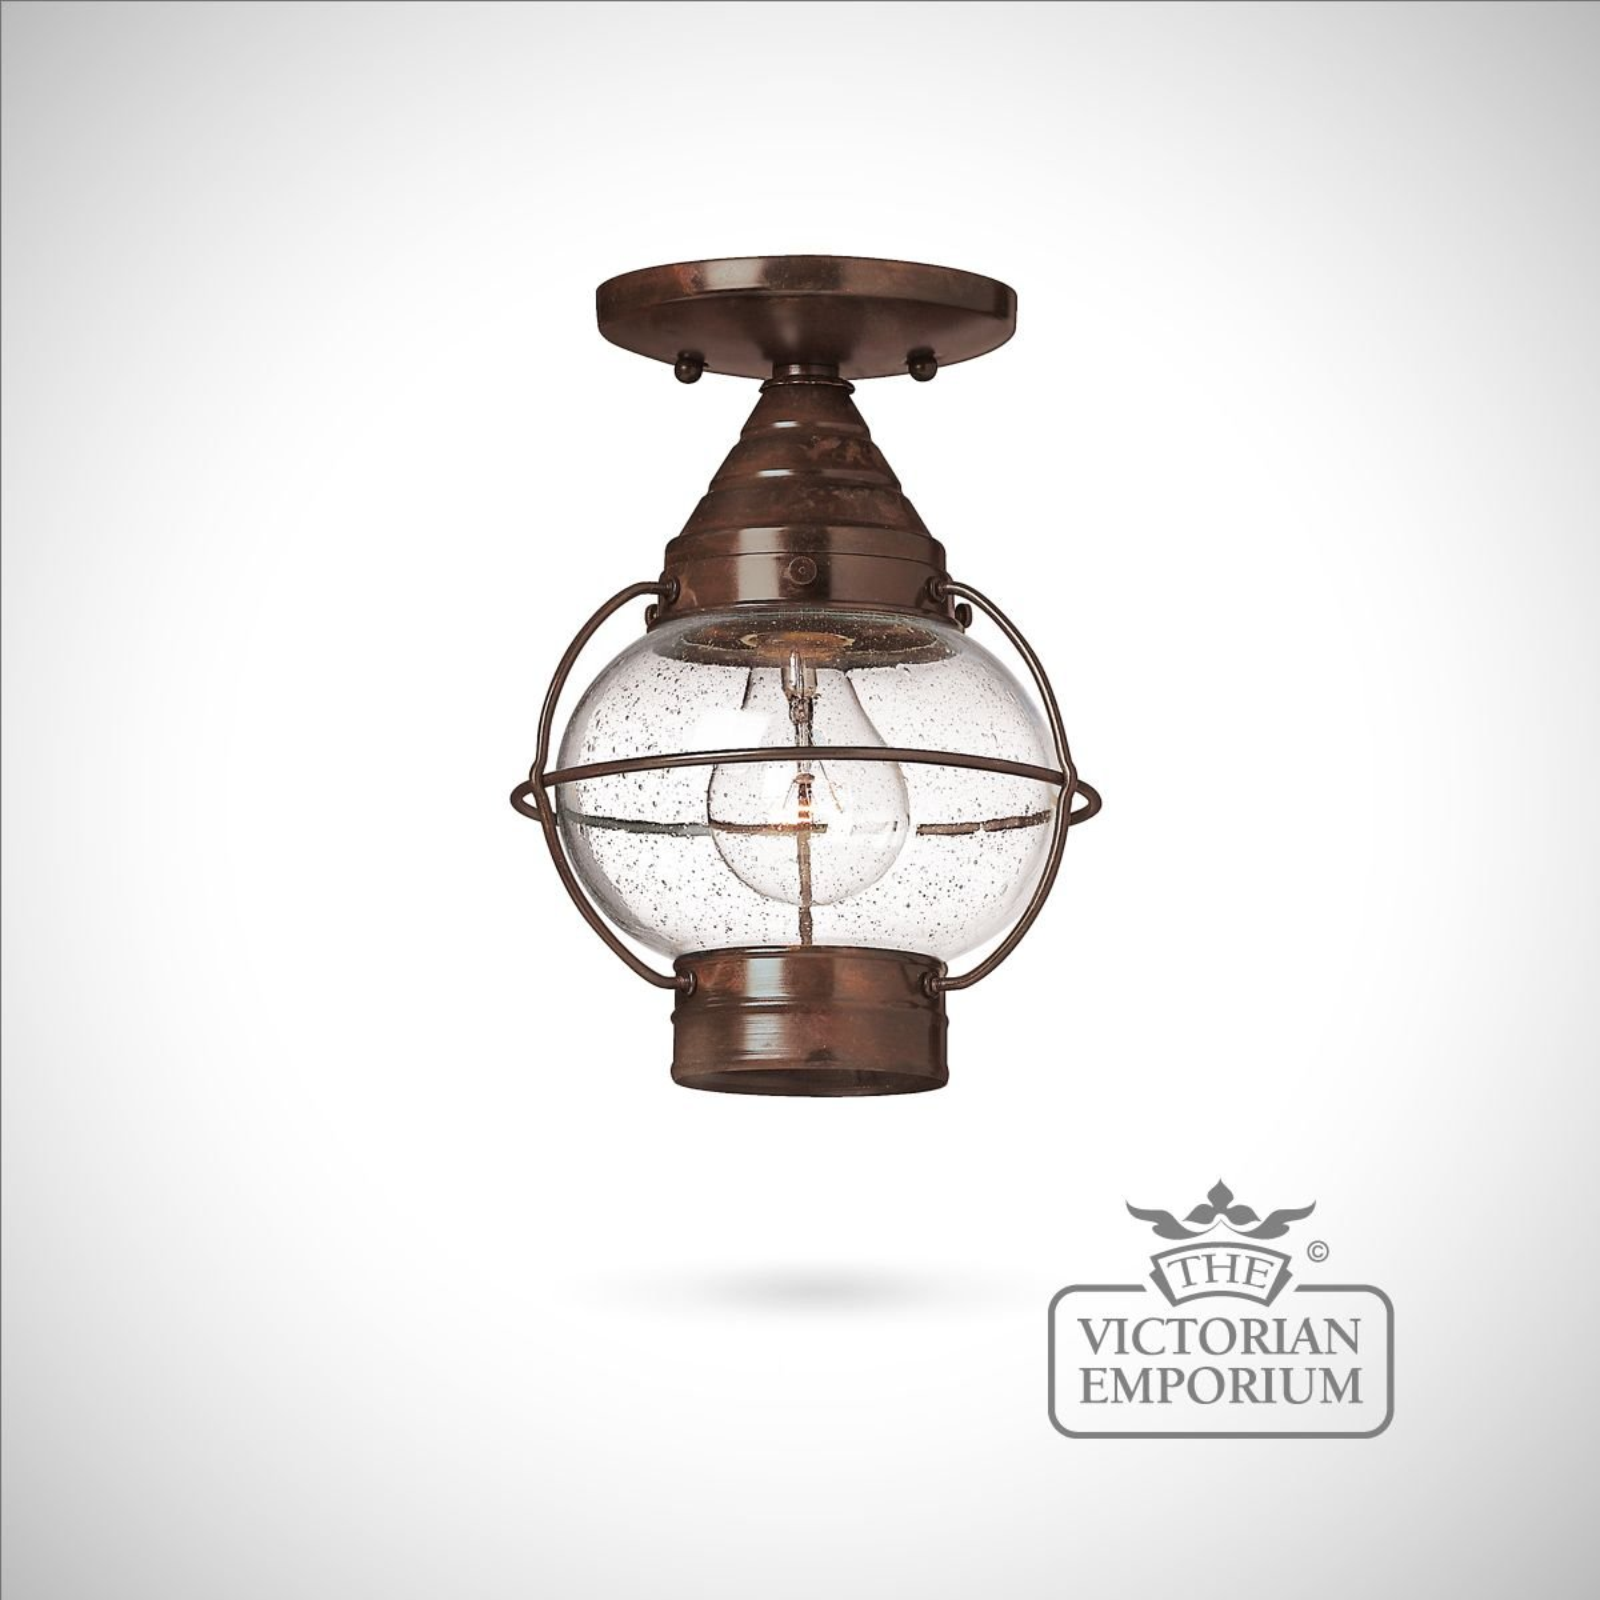 Reproduction victorian wallpaper guide the victorian emporium - Classic Onion Lantern In Sienna Bronze Medium